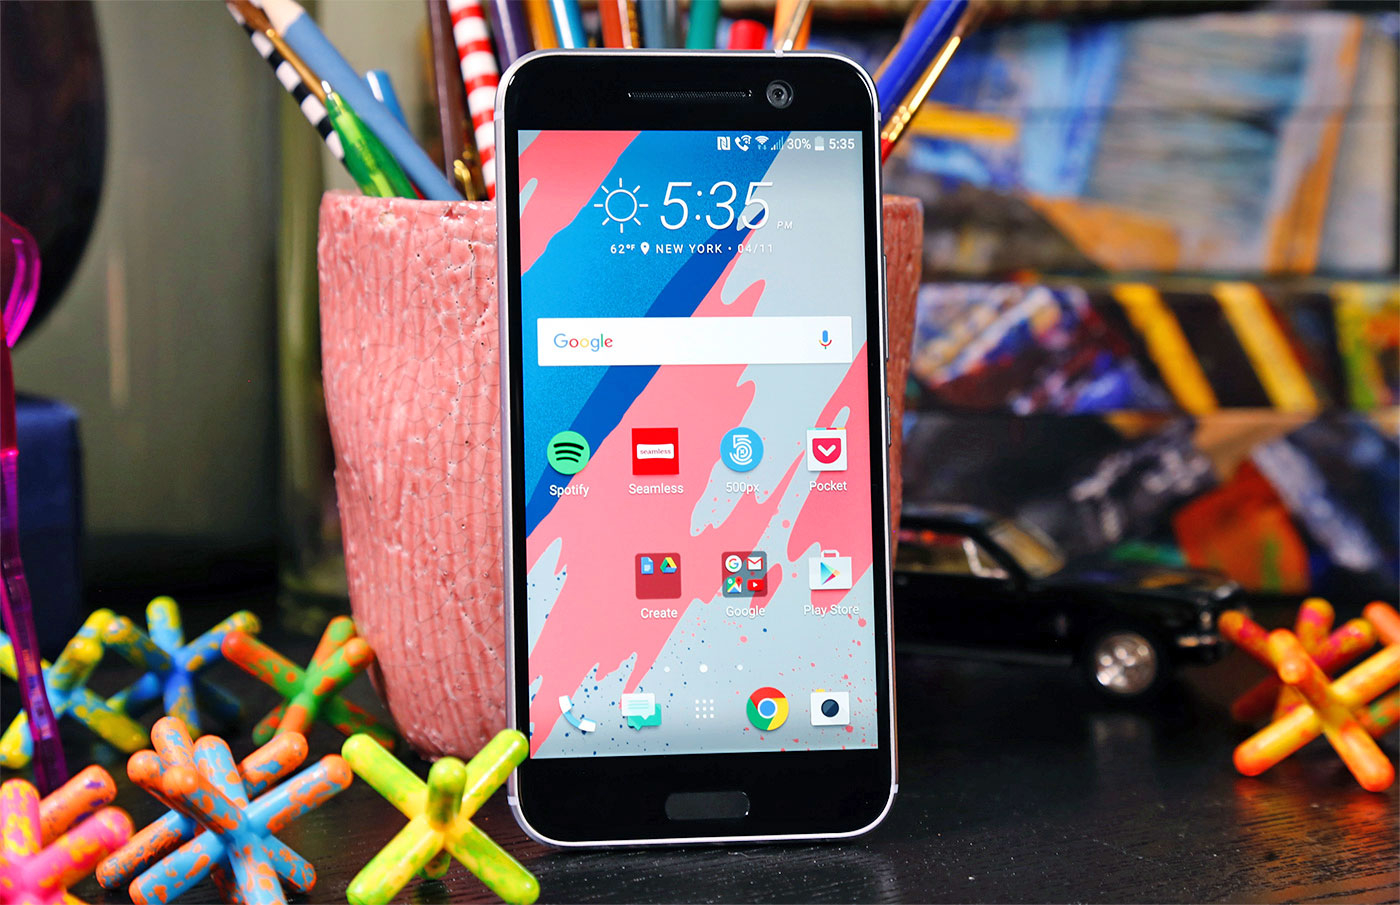 Un problema de seguridad de Qualcomm afecta a millones de teléfonos Android